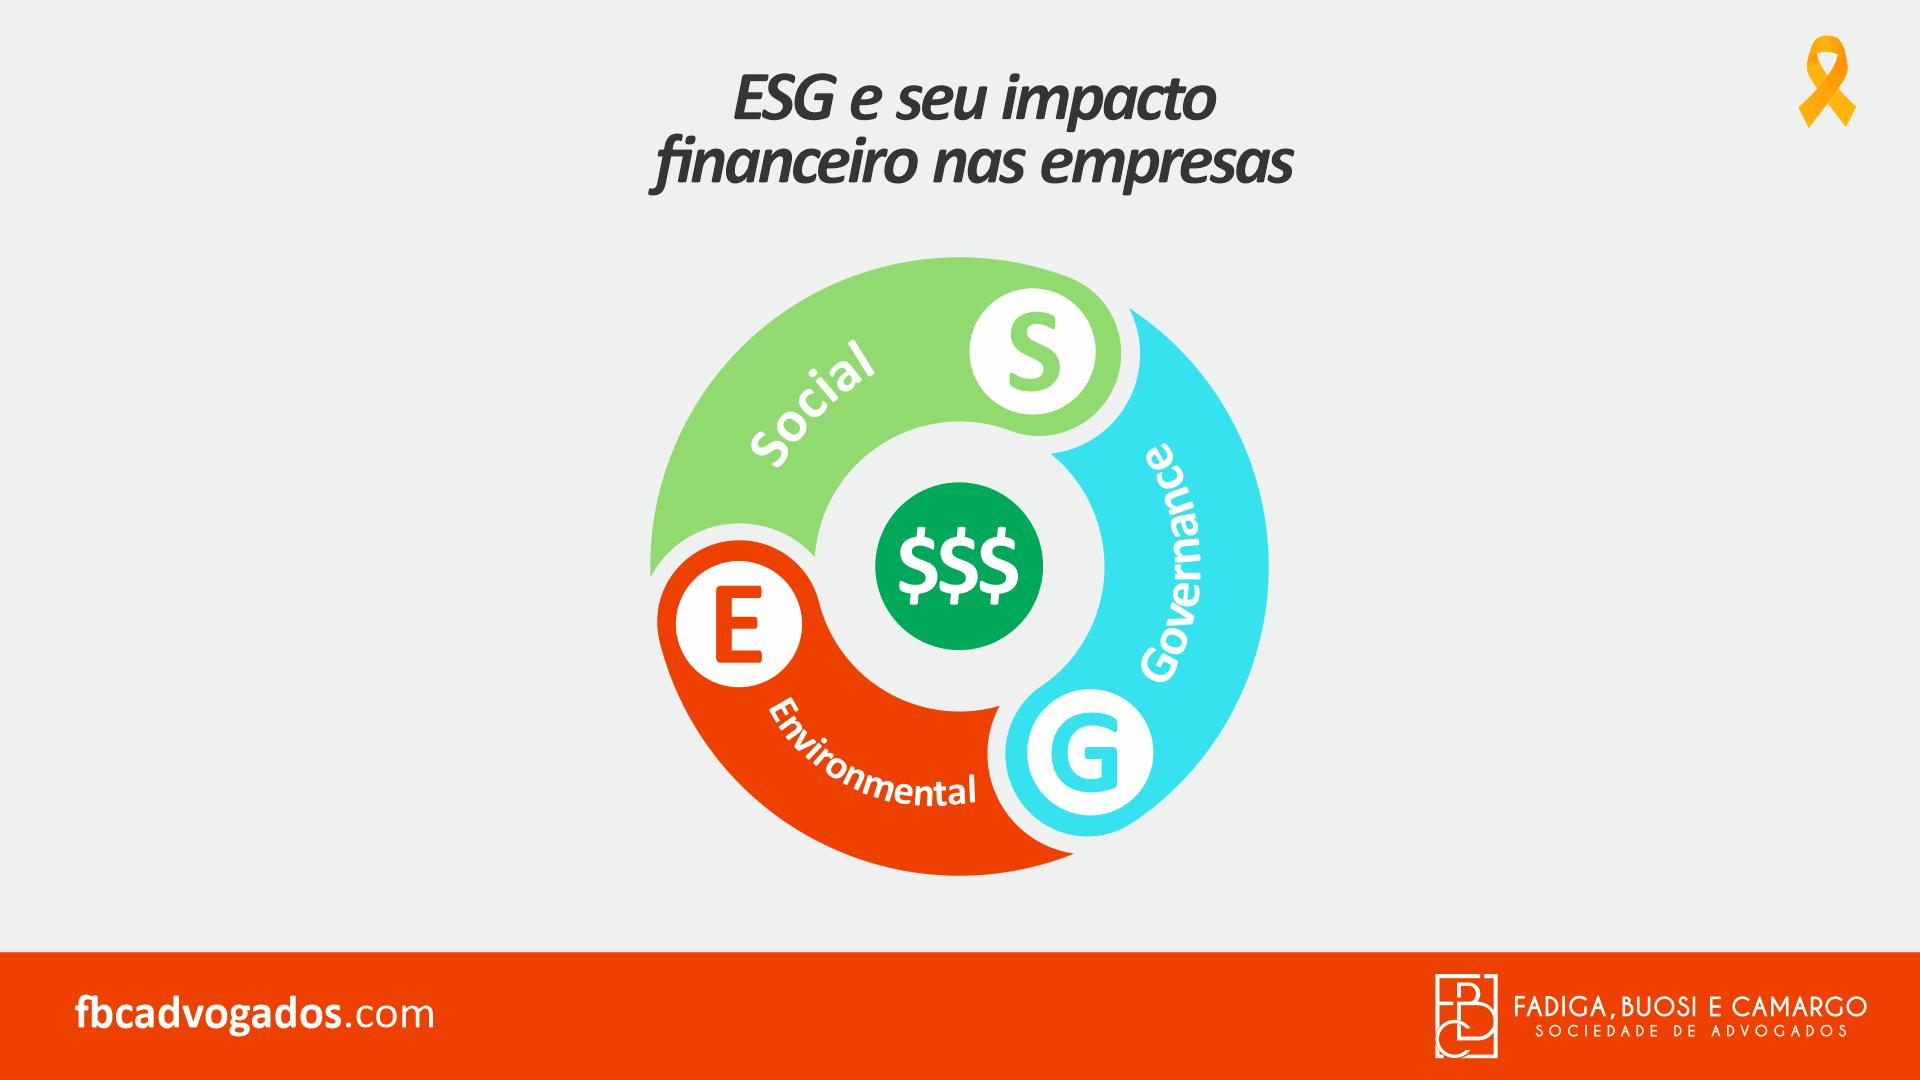 ESG e seu impacto financeiro nas empresas